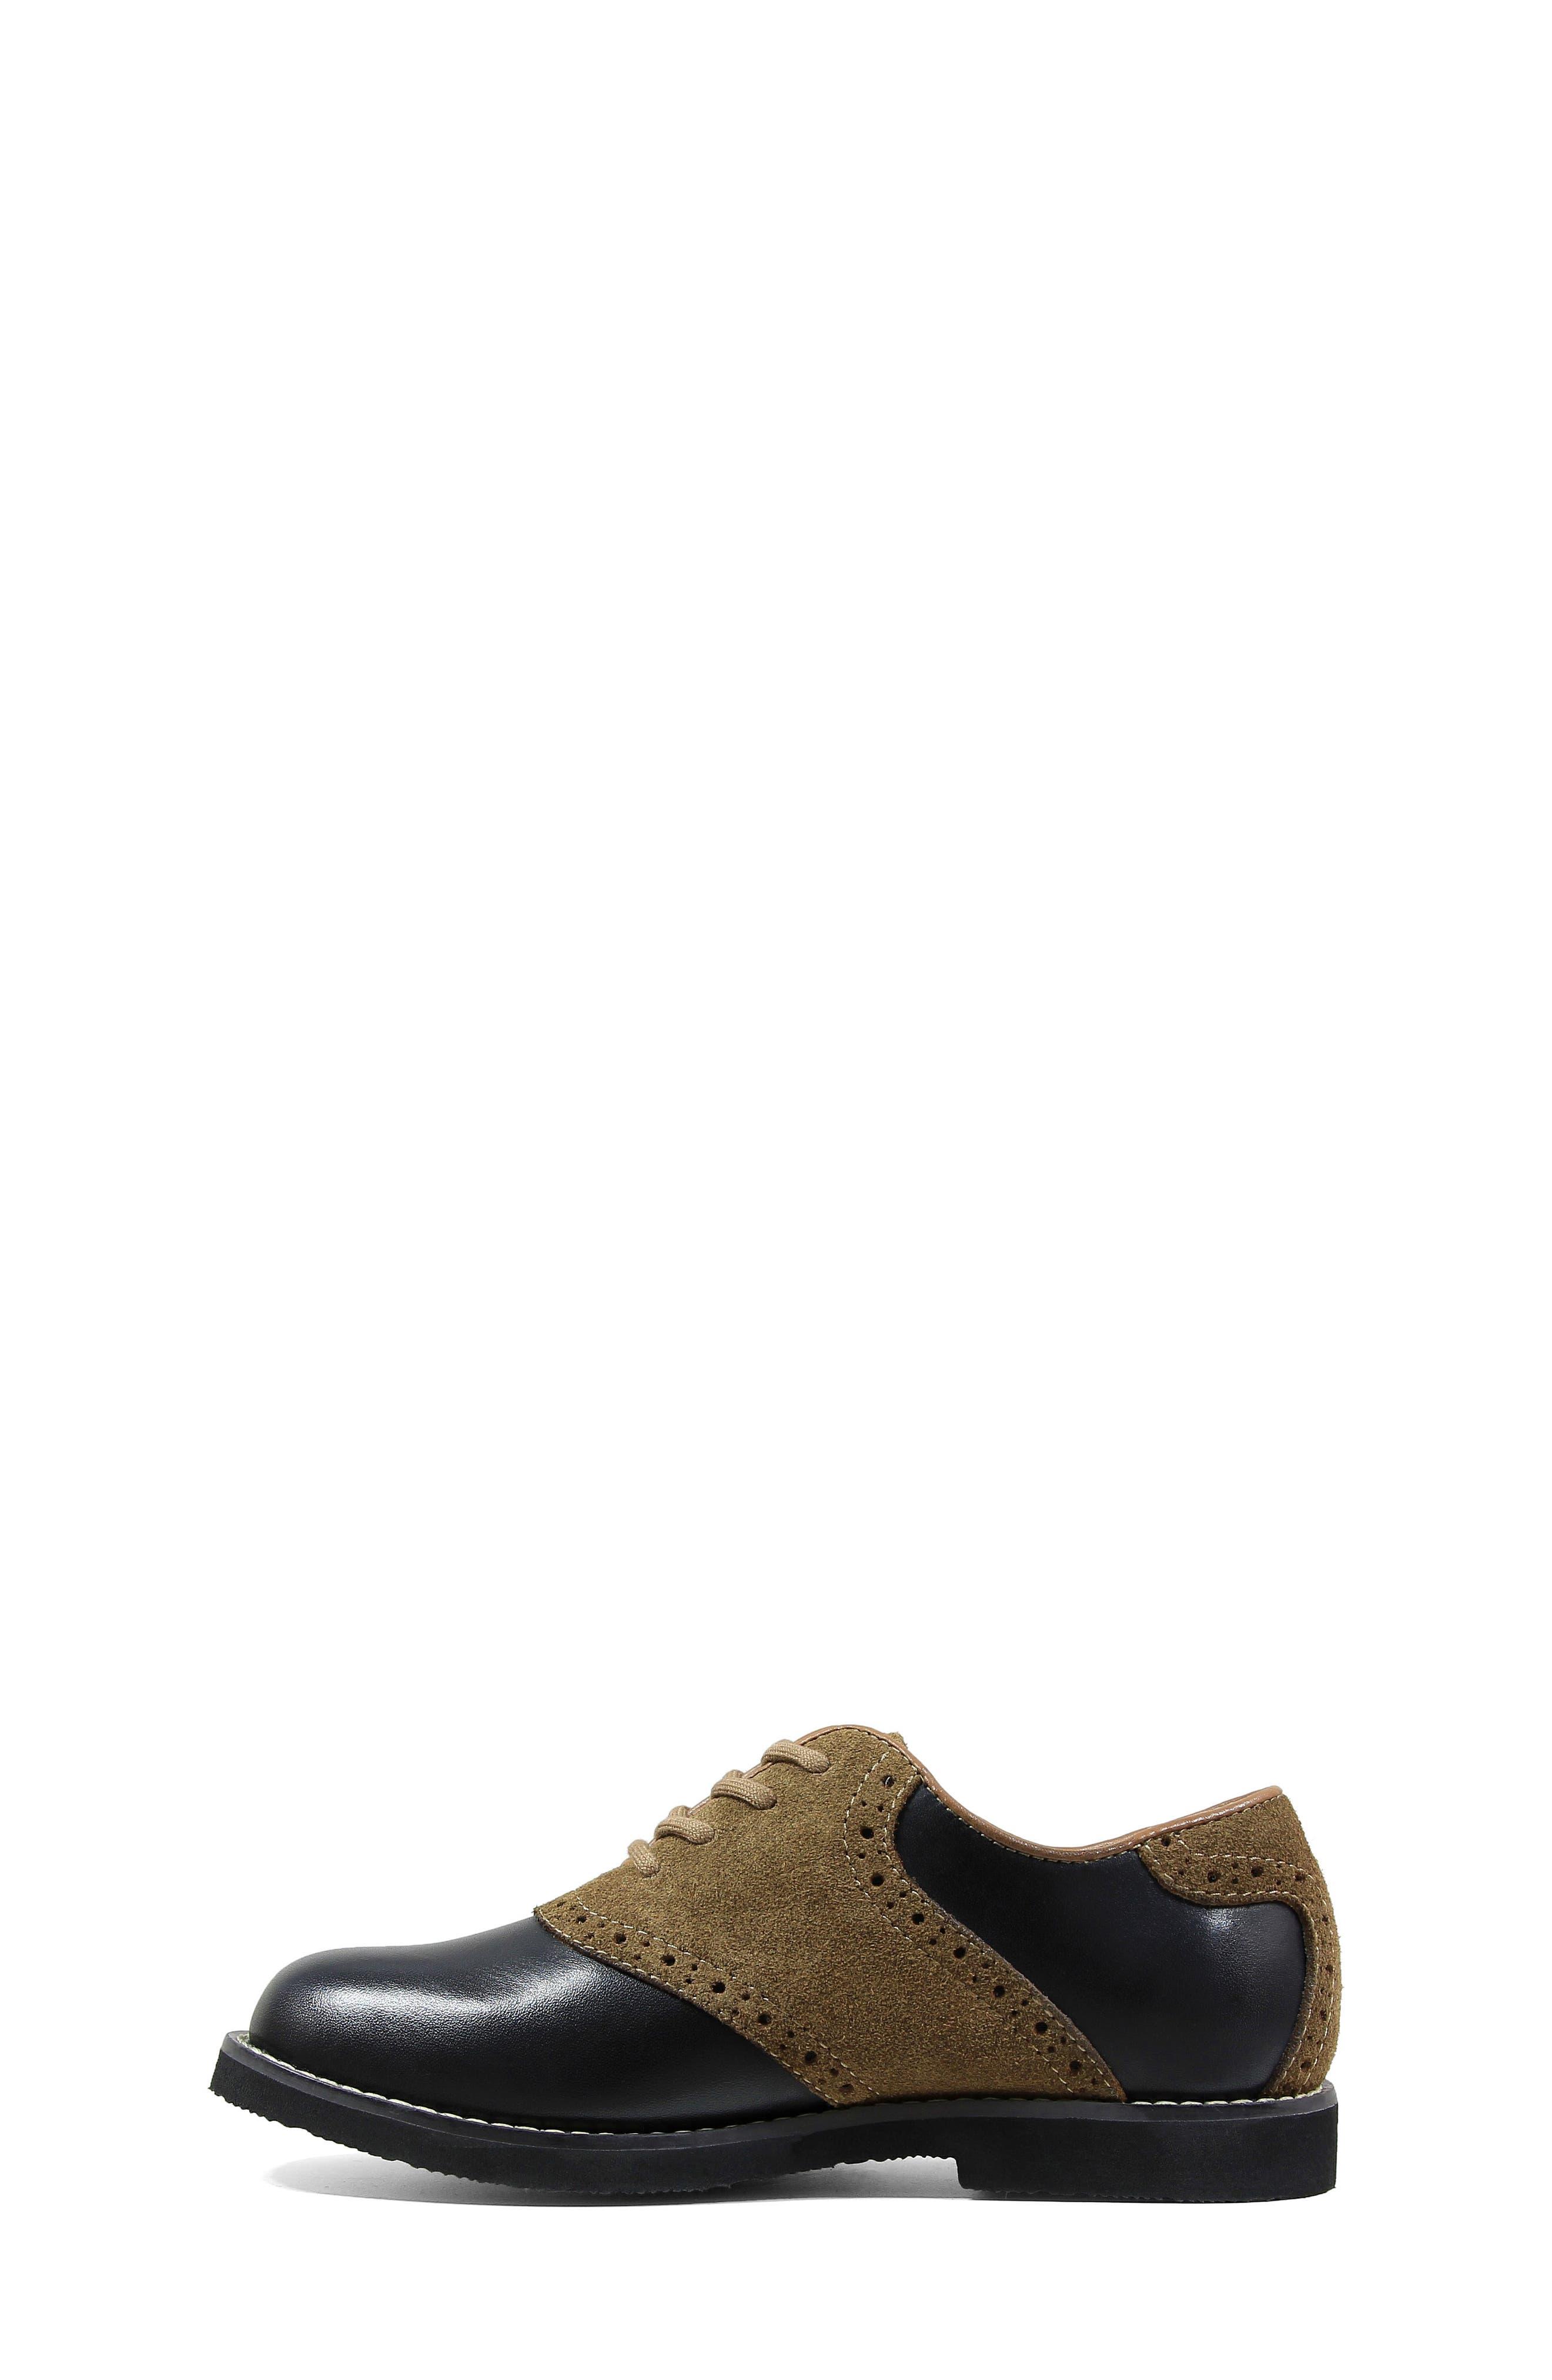 'Kennett Jr. II' Saddle Shoe,                             Alternate thumbnail 2, color,                             SMOOTH BLACK W/ MOCHA SUEDE